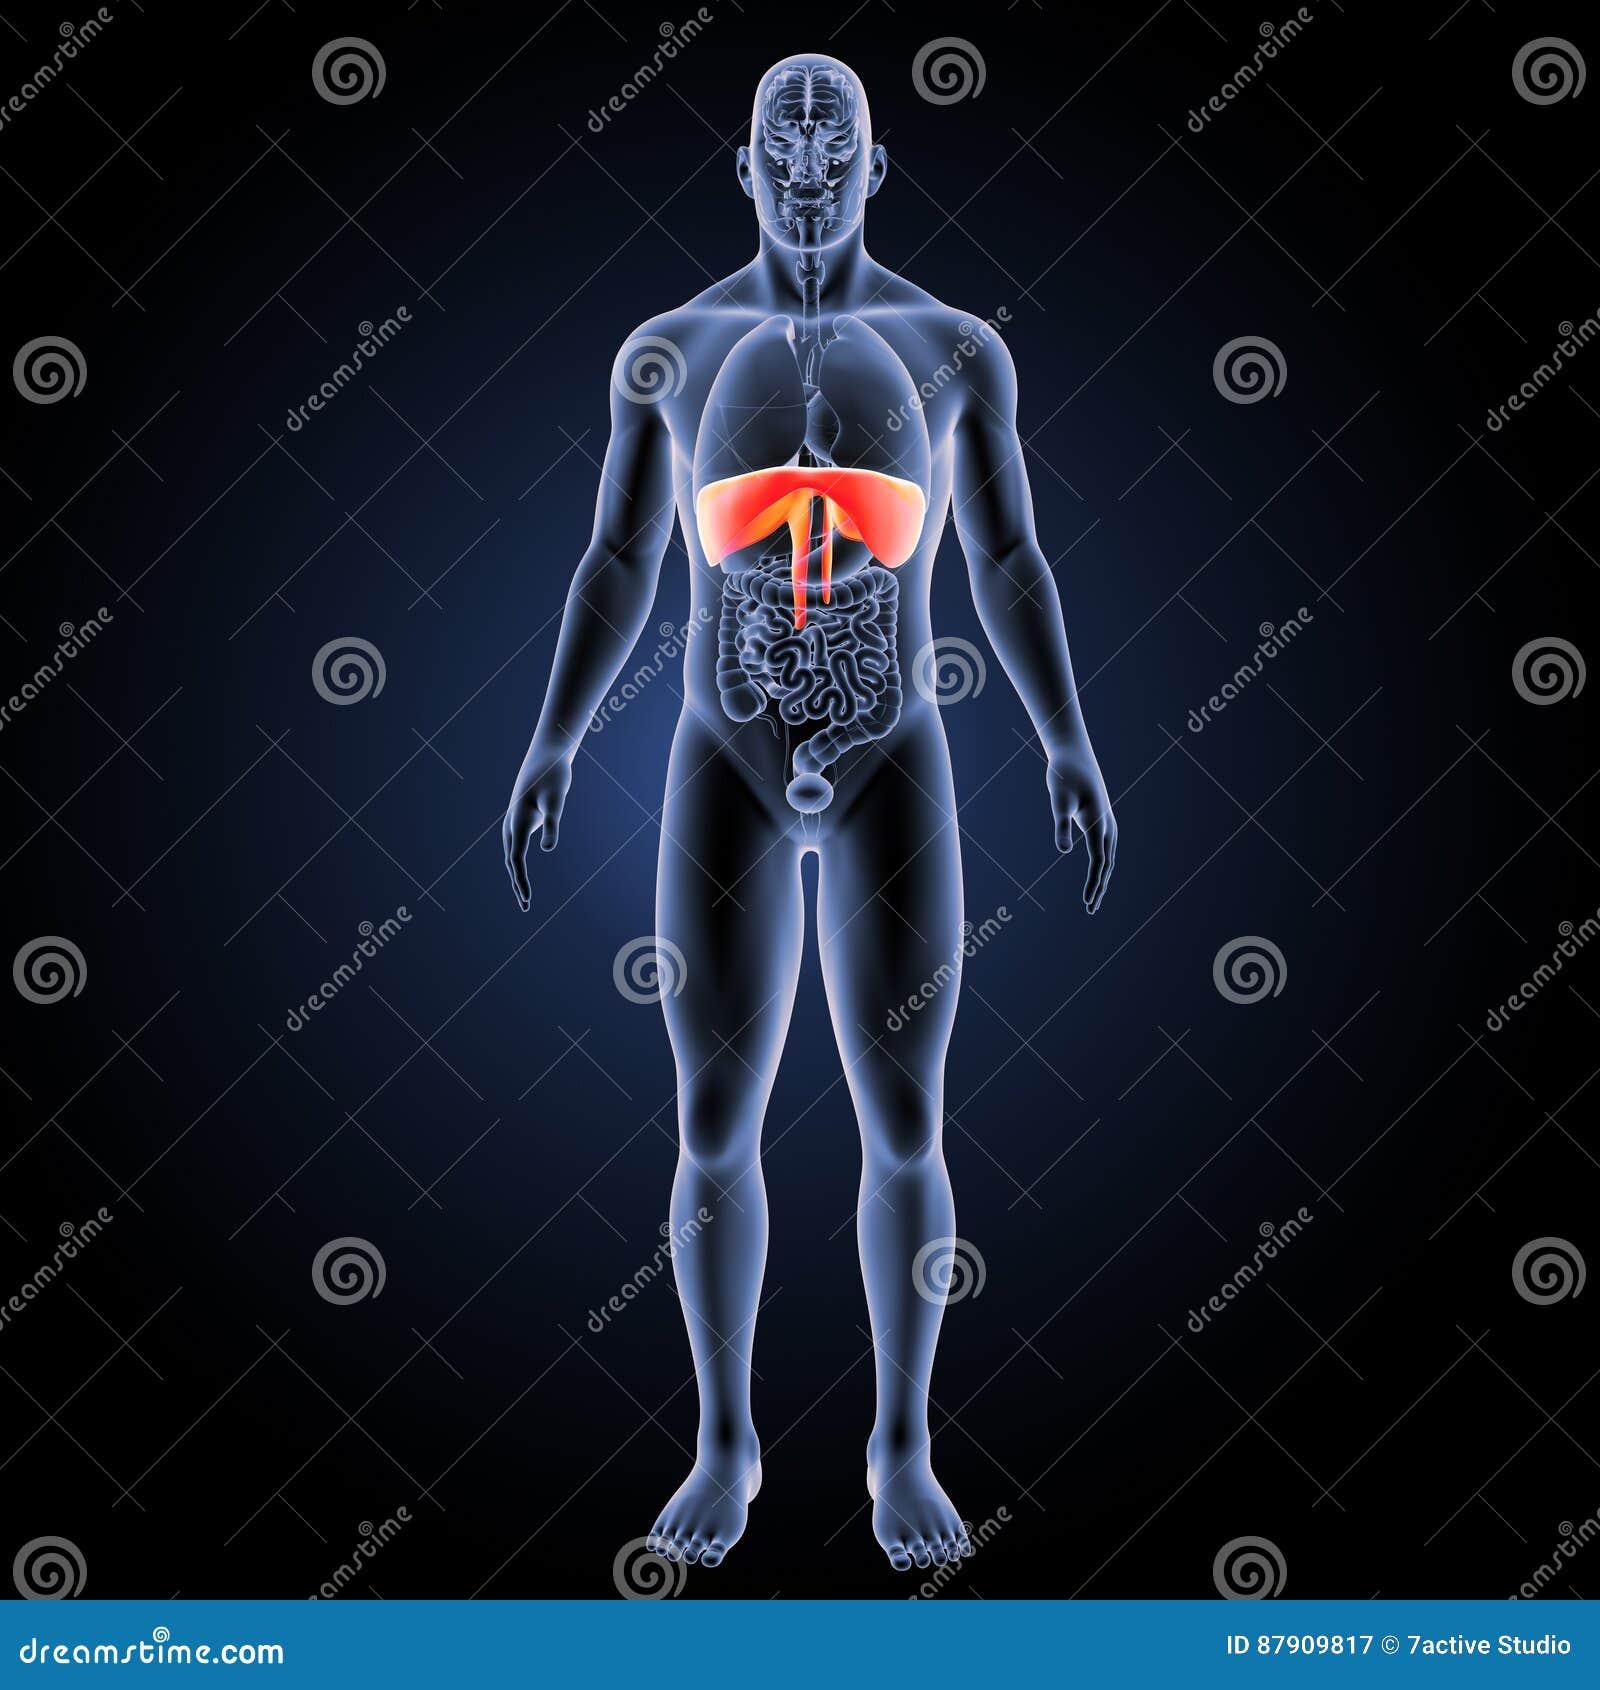 Diaphragm With Organs Anterior View Stock Illustration ...